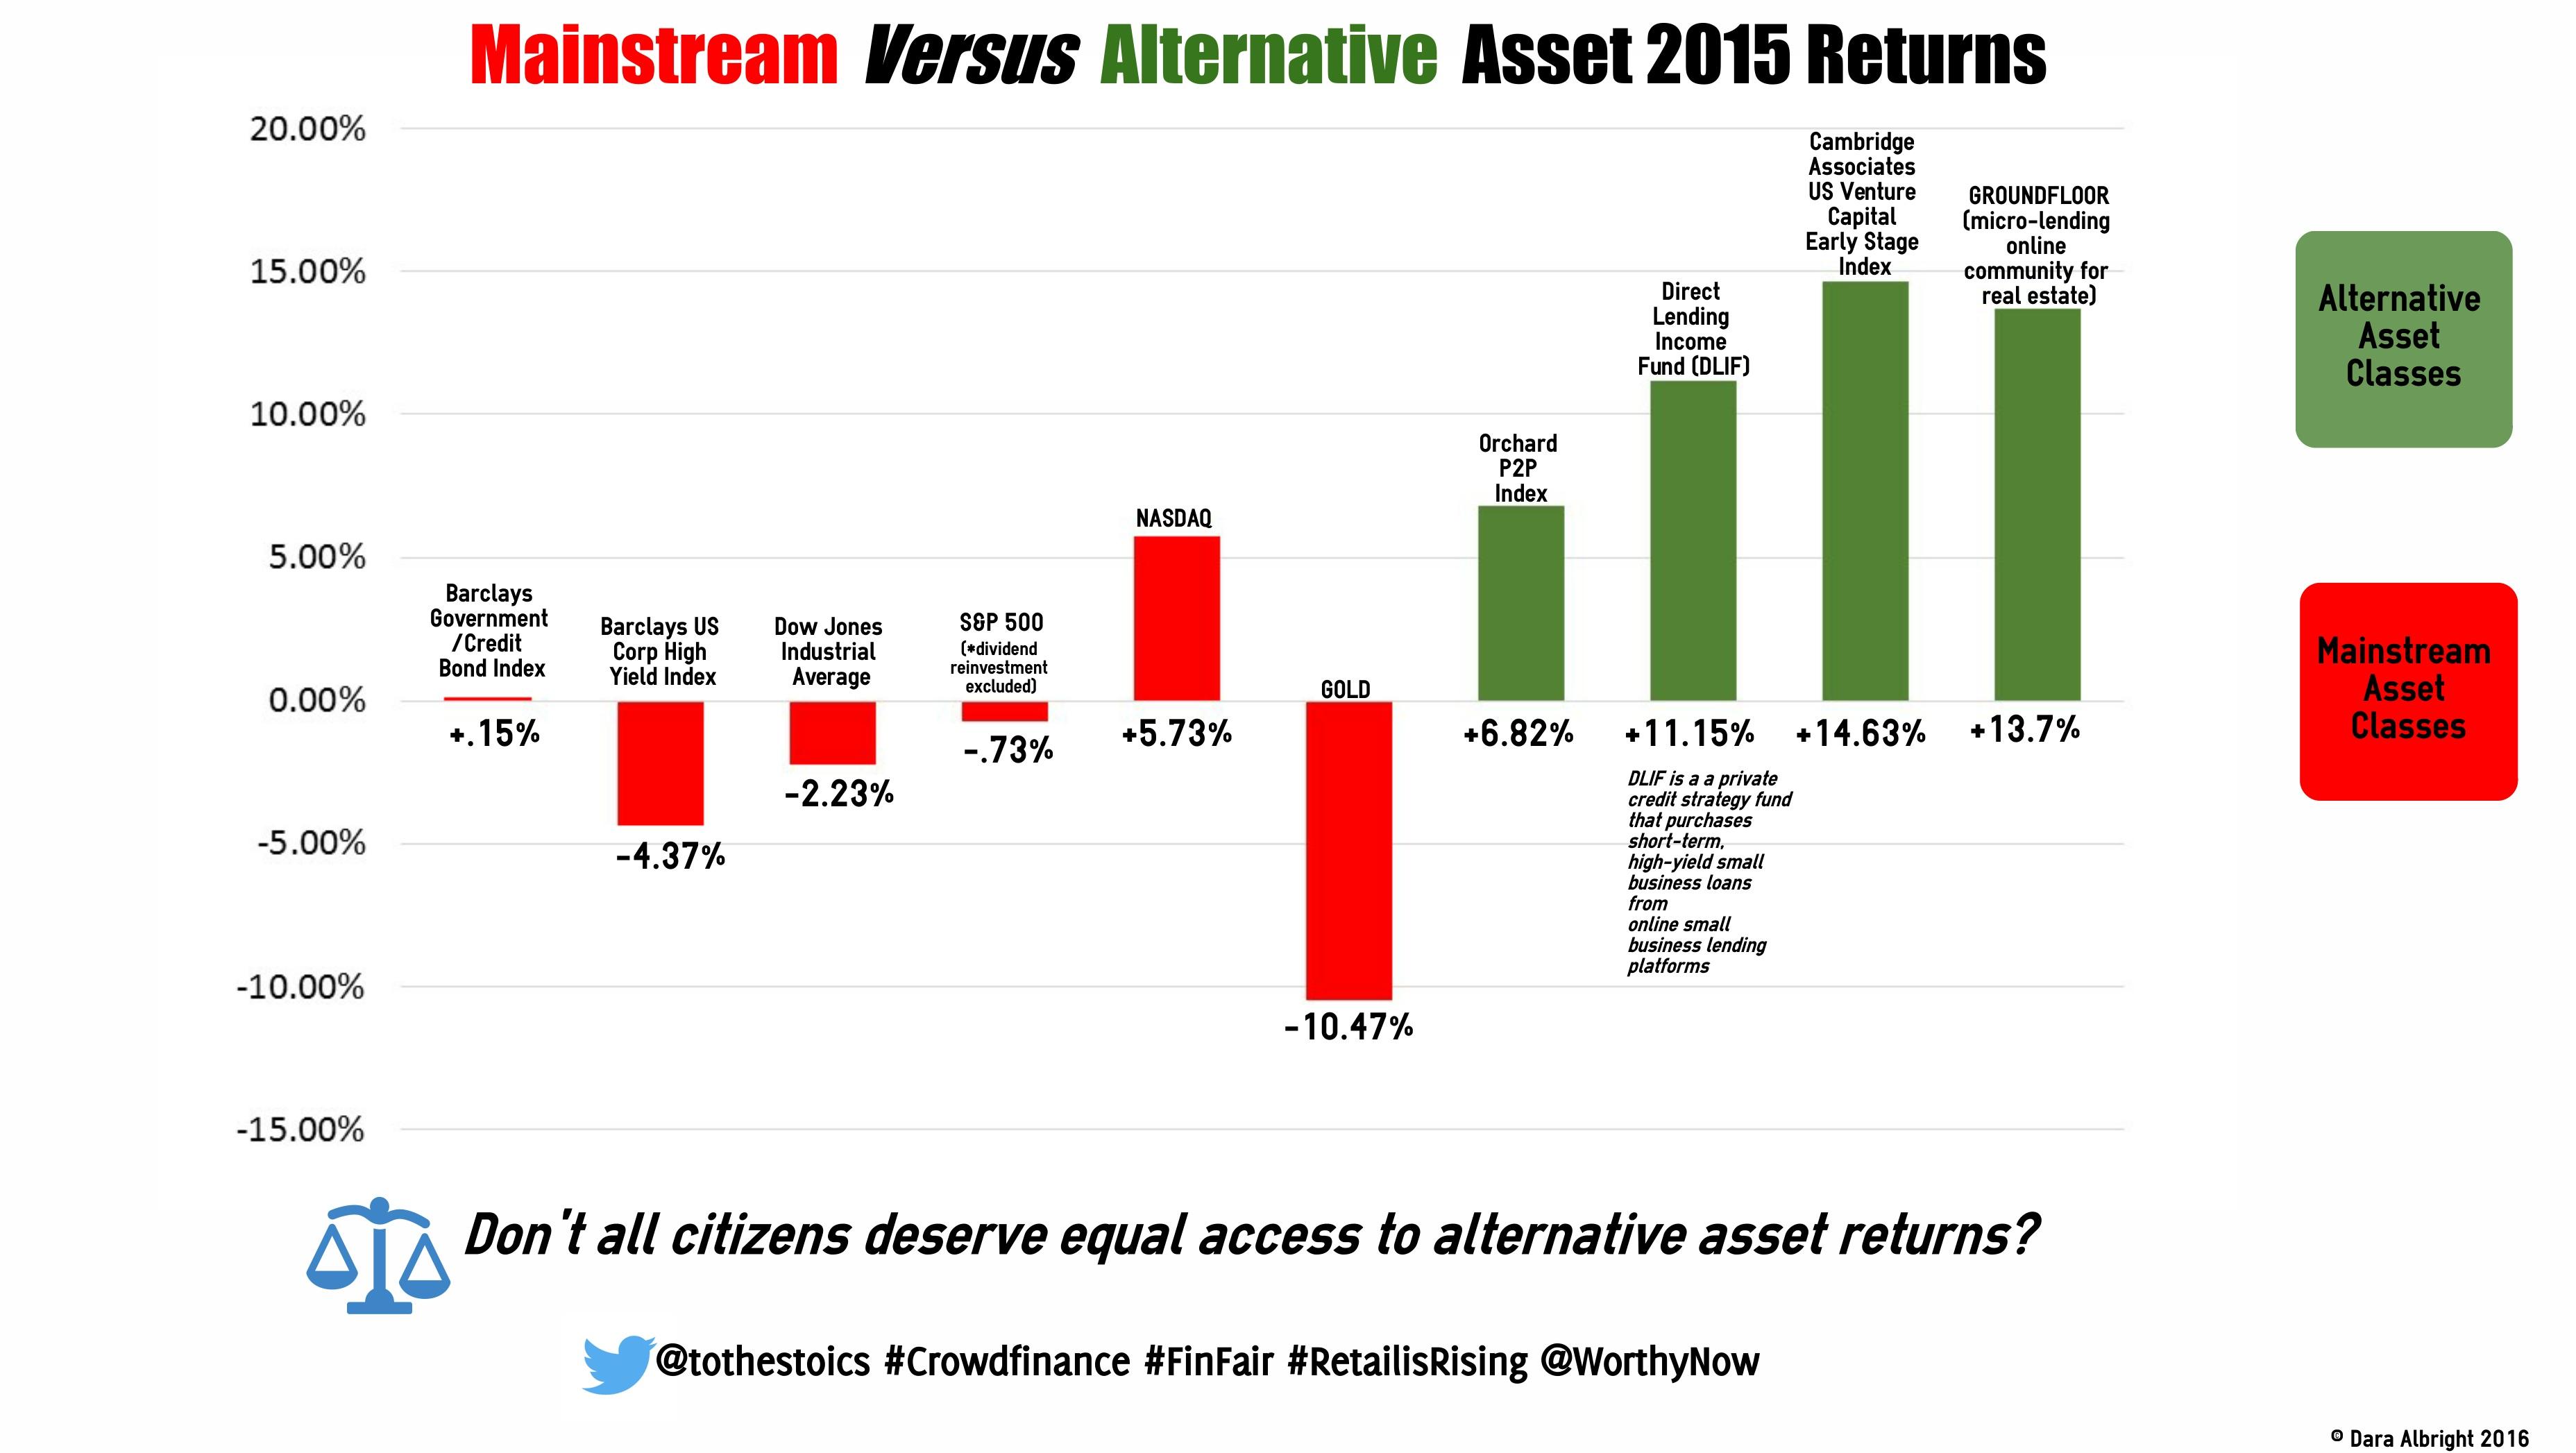 Mainstream Versus Alternative Asset 2015 Returns